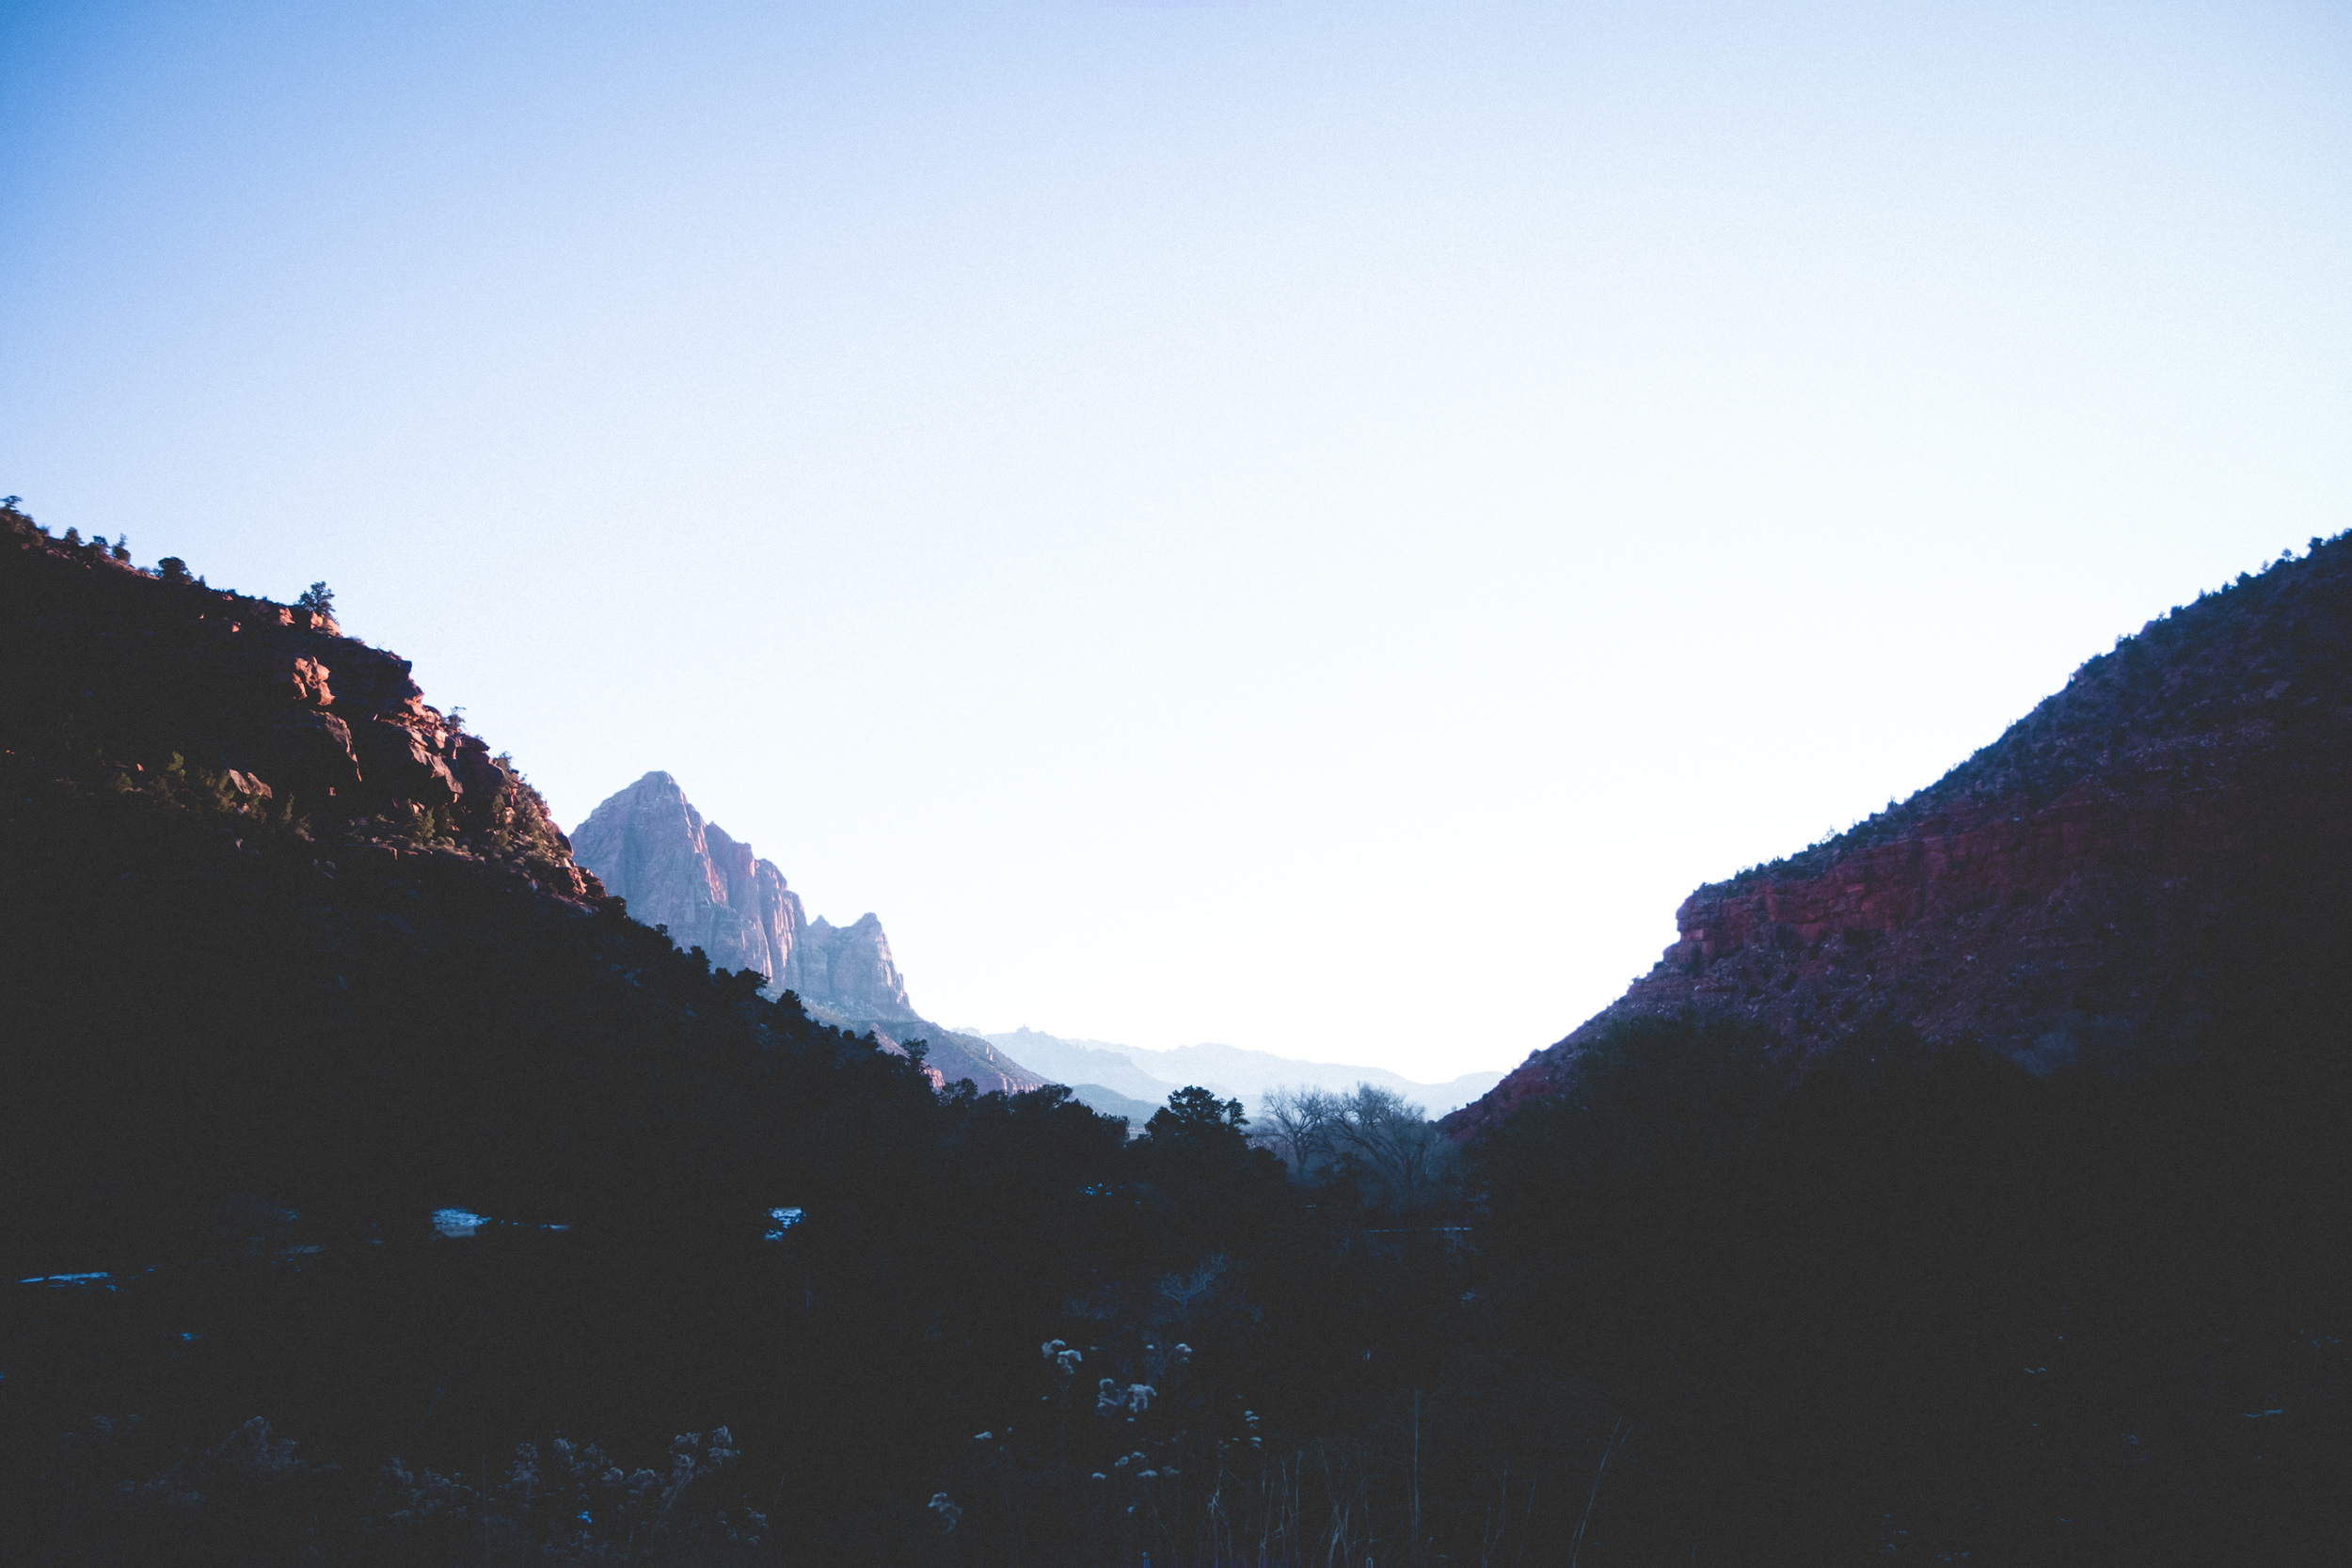 Zion-National-Park-40.jpg